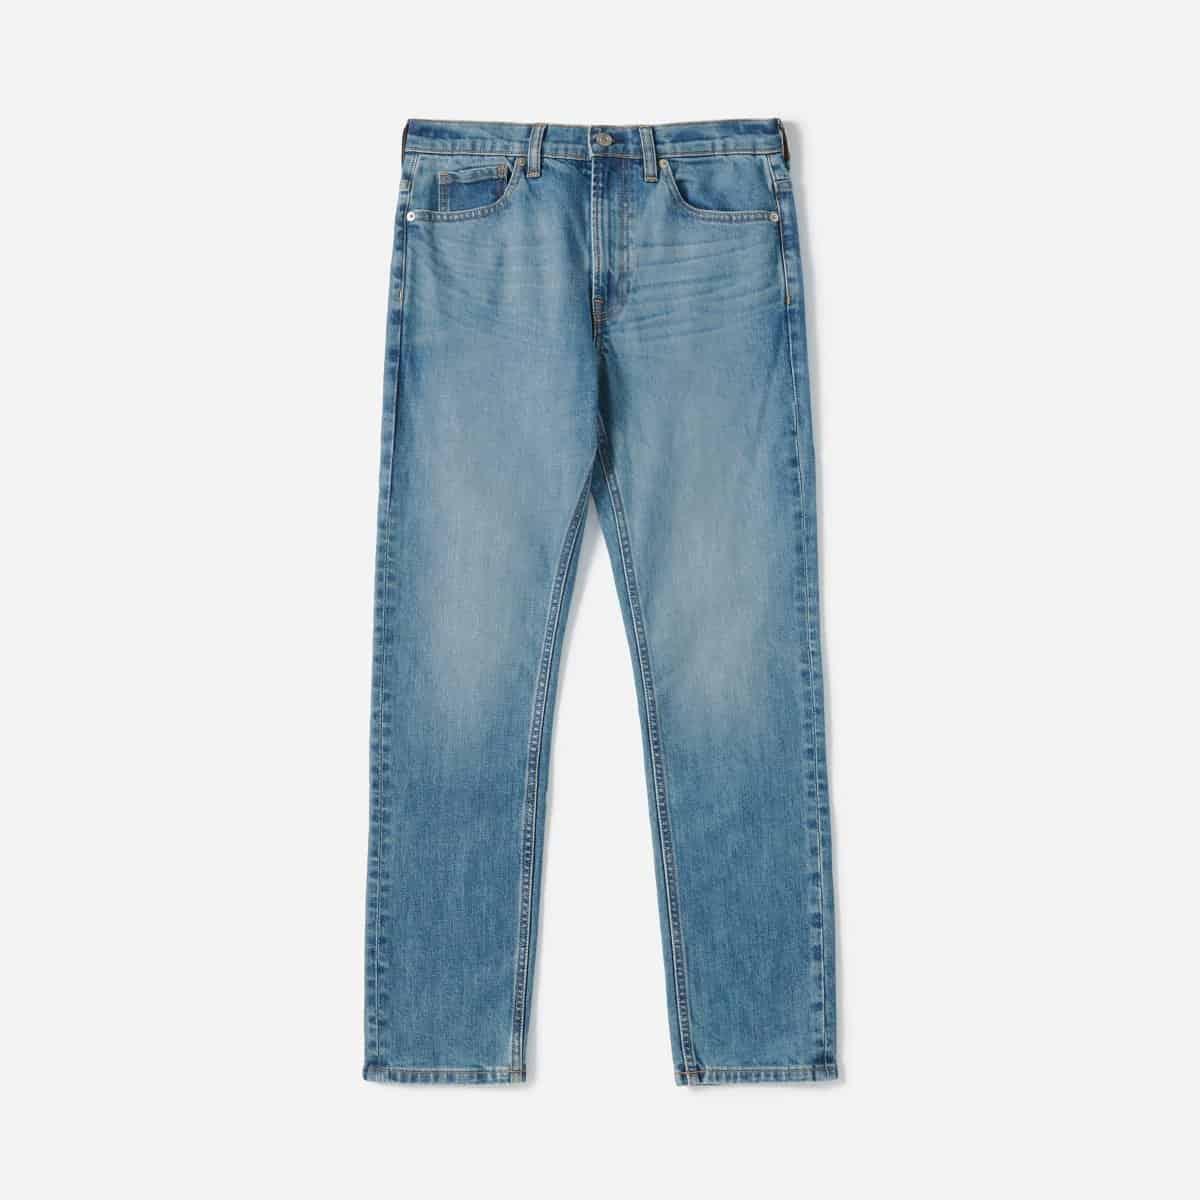 Everlane Slim Fit Jean